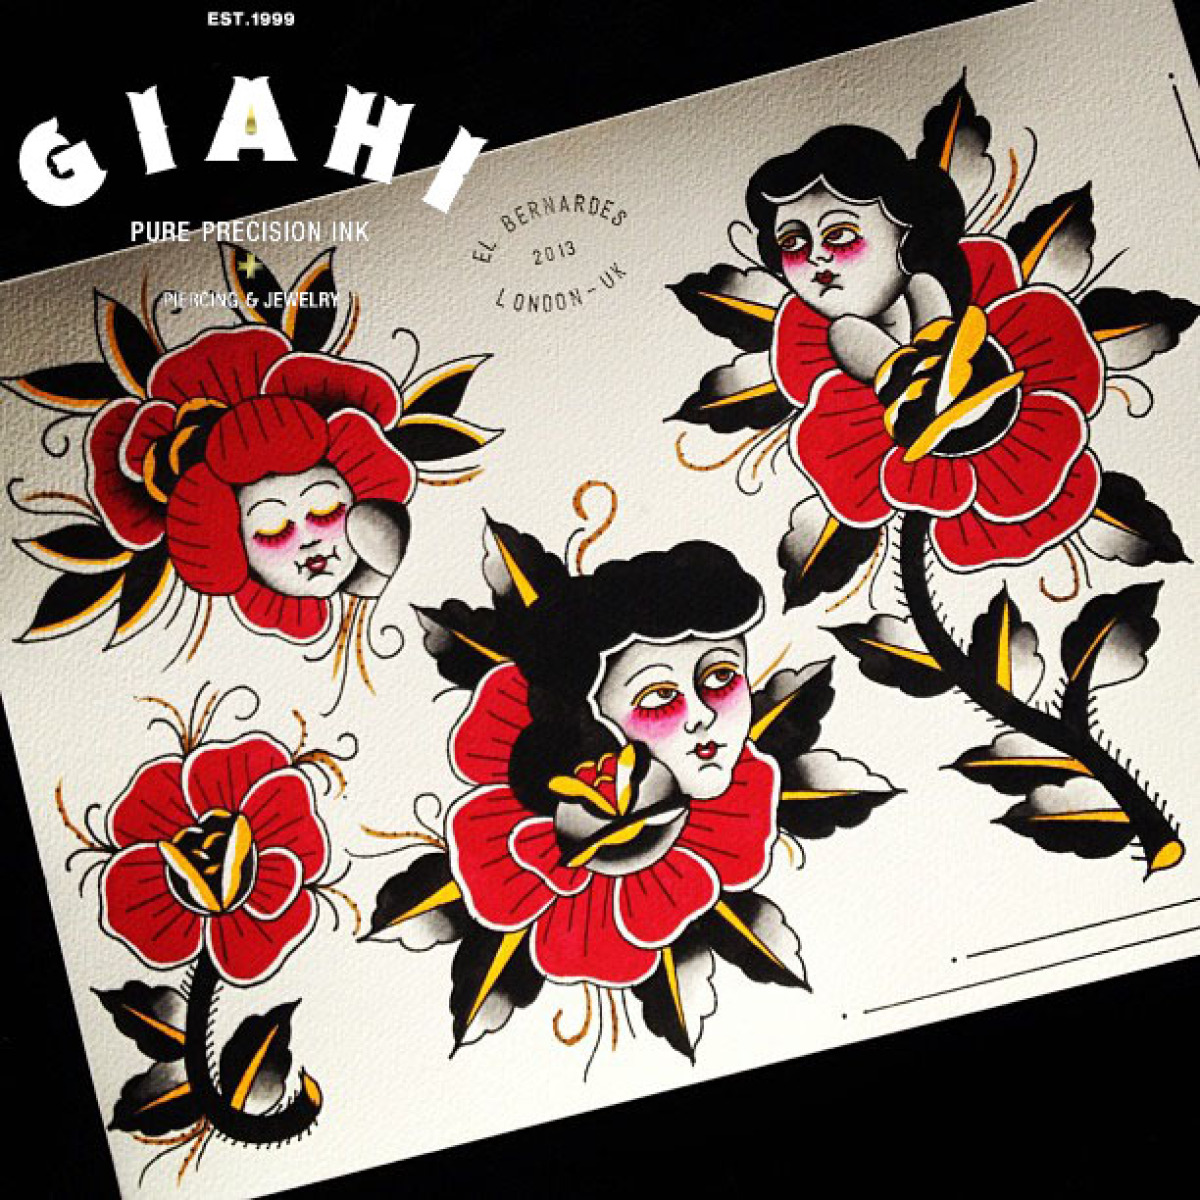 Old School Rose Ladies tattoo ideas by Elda Bernardes